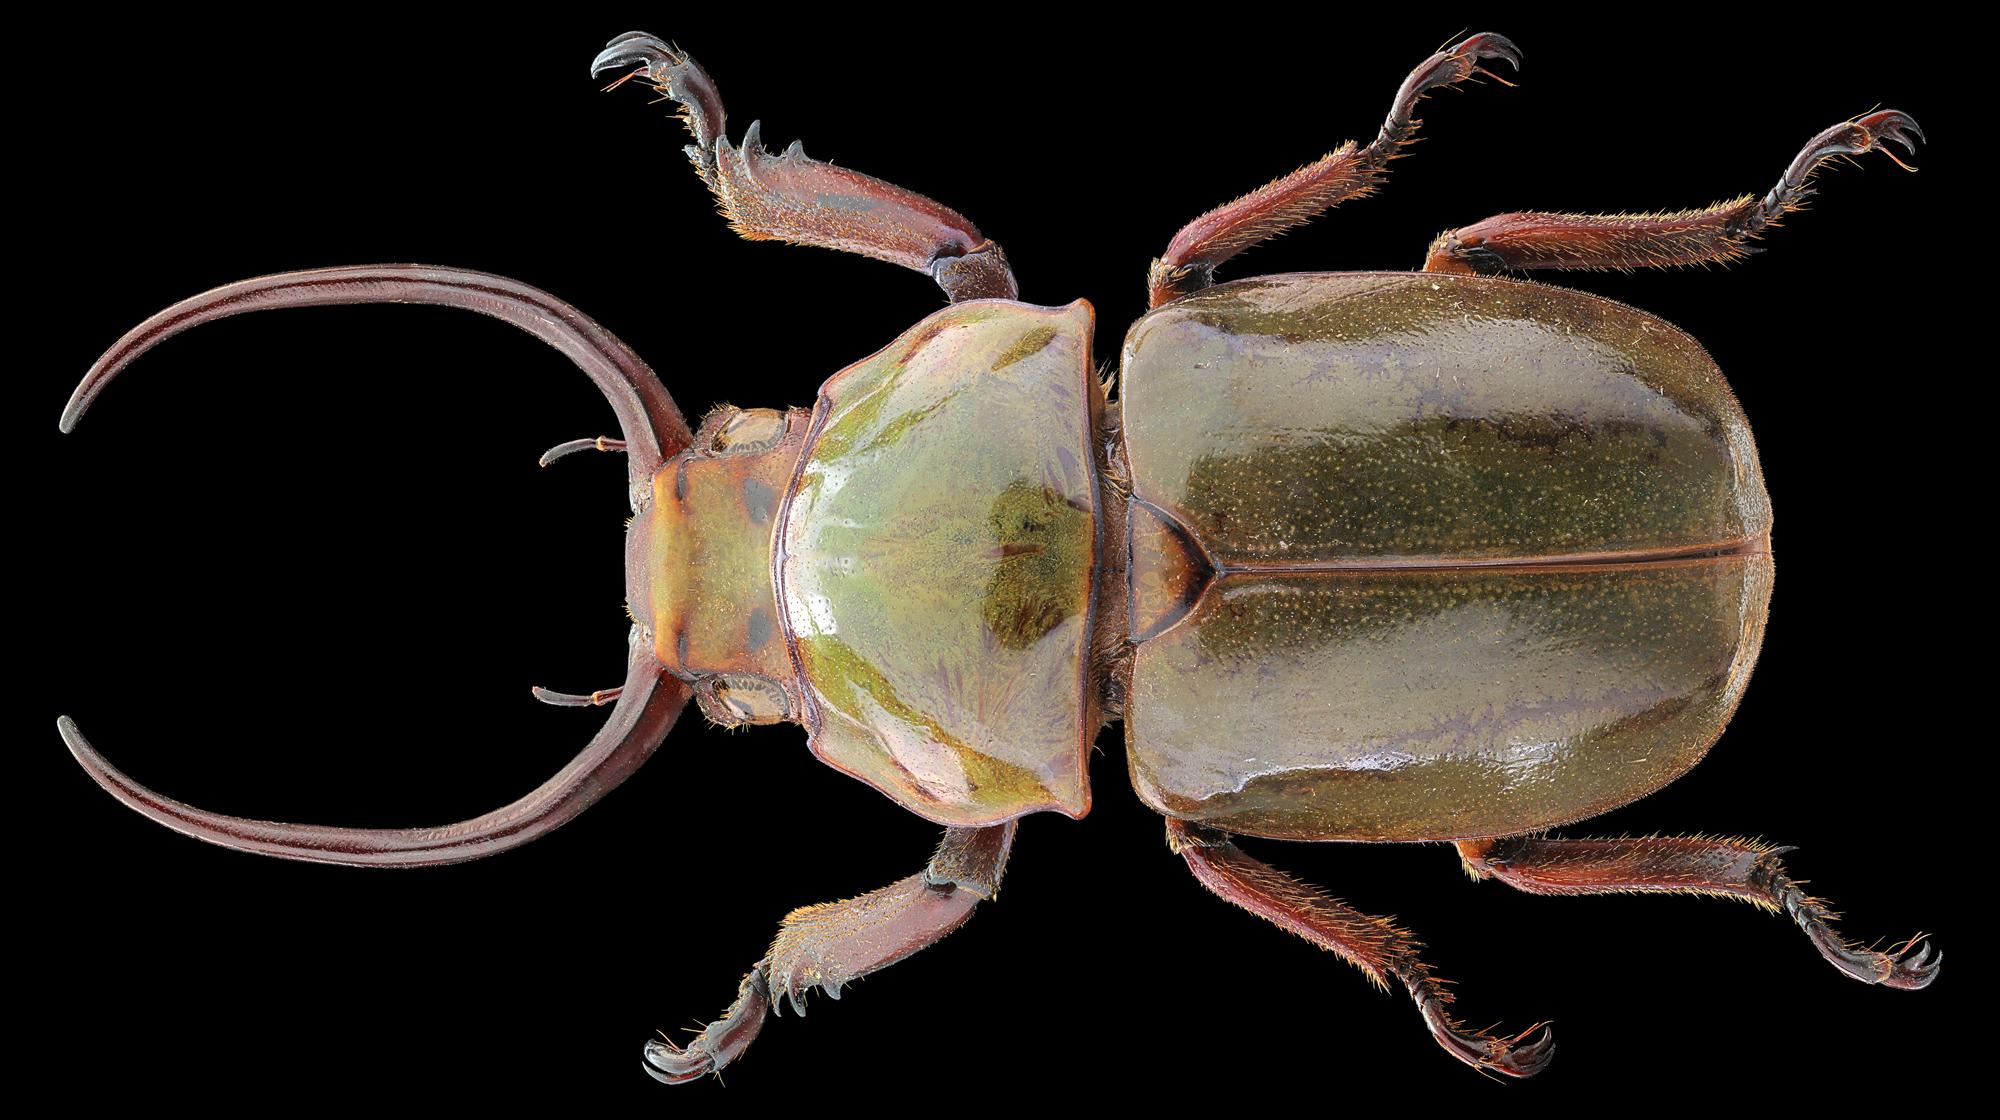 Kibakoganea Tamdaoensis Minor...